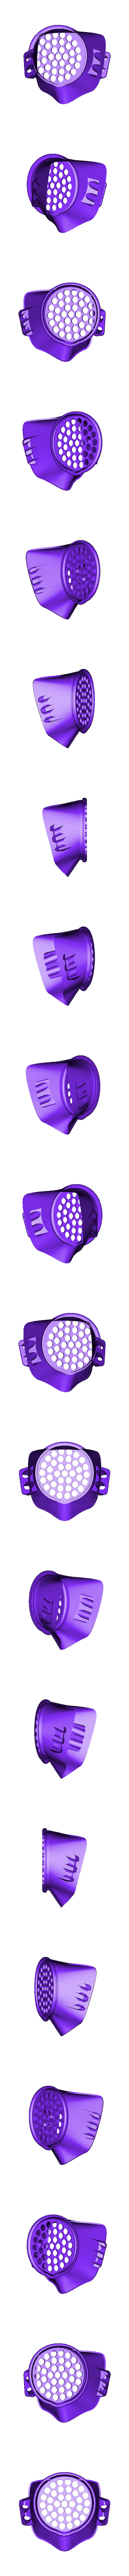 size2.stl Download free STL file COVİD 19 MASK ! • 3D printing design, pypltrkndlk